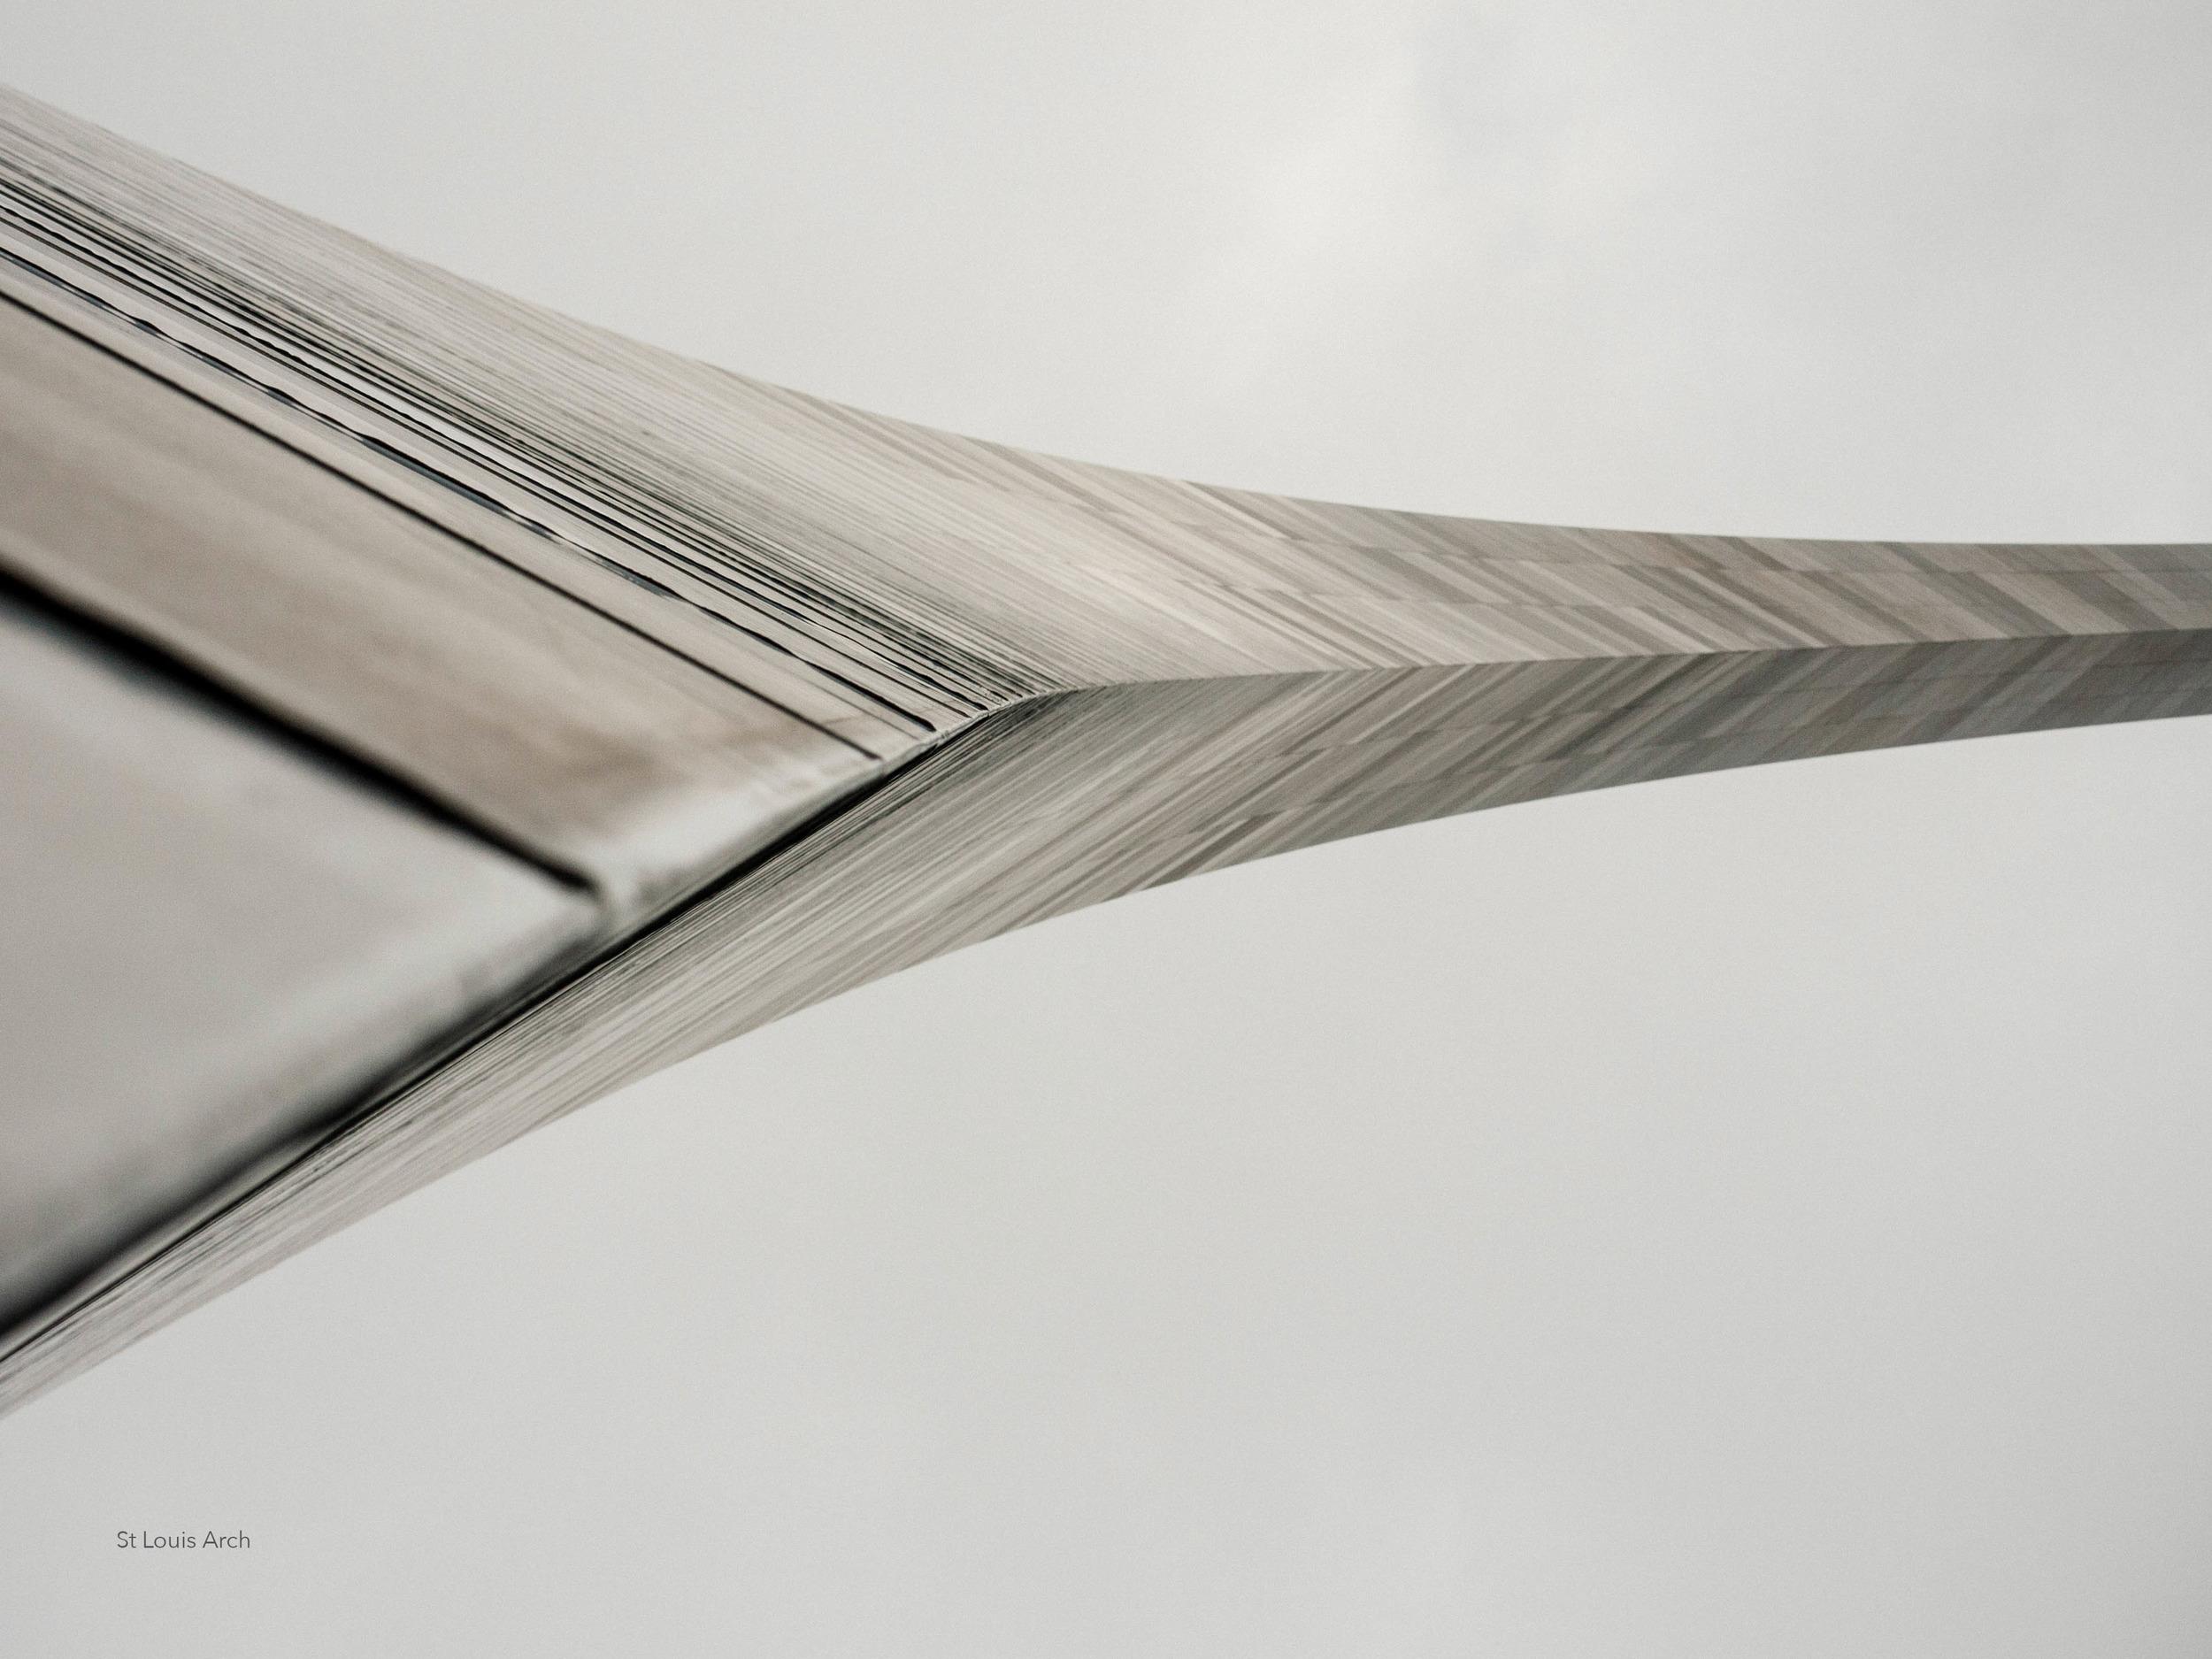 St Louis Gateway Arch photo spread